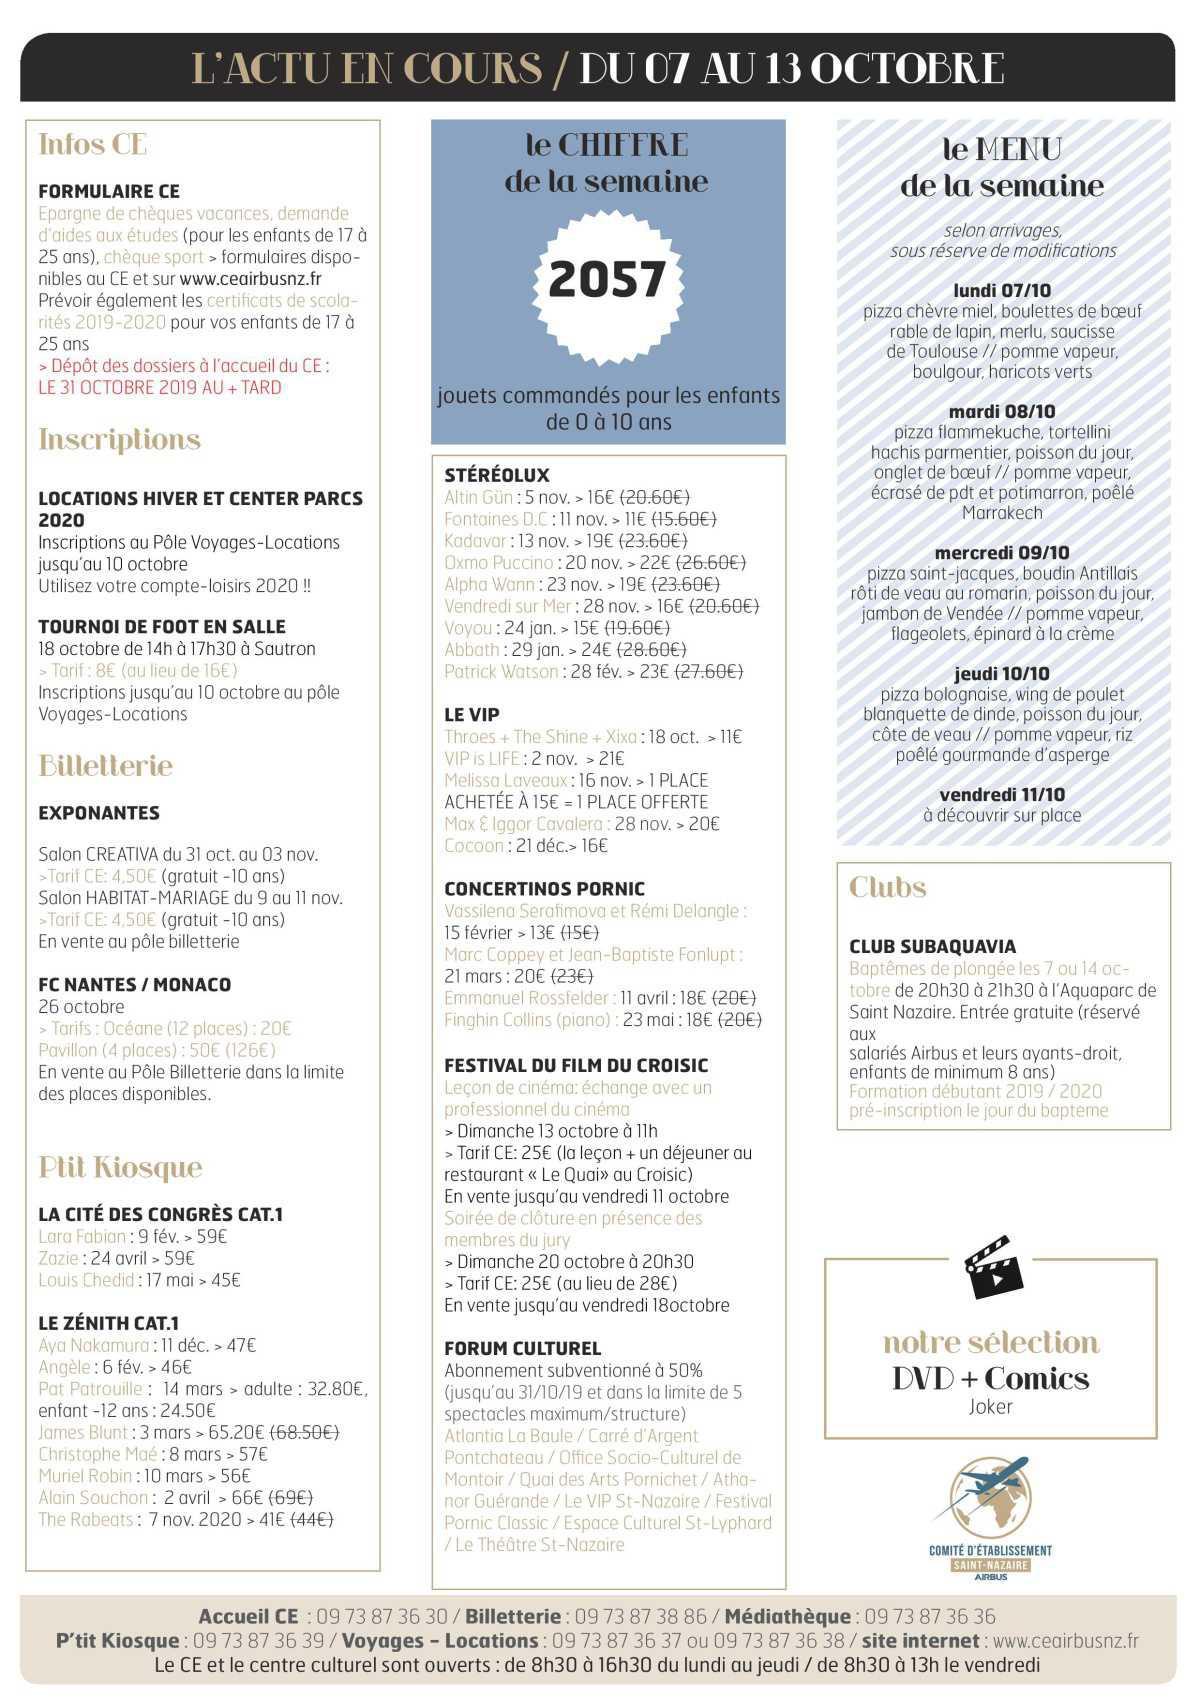 Infos CE / COOP semaine 41